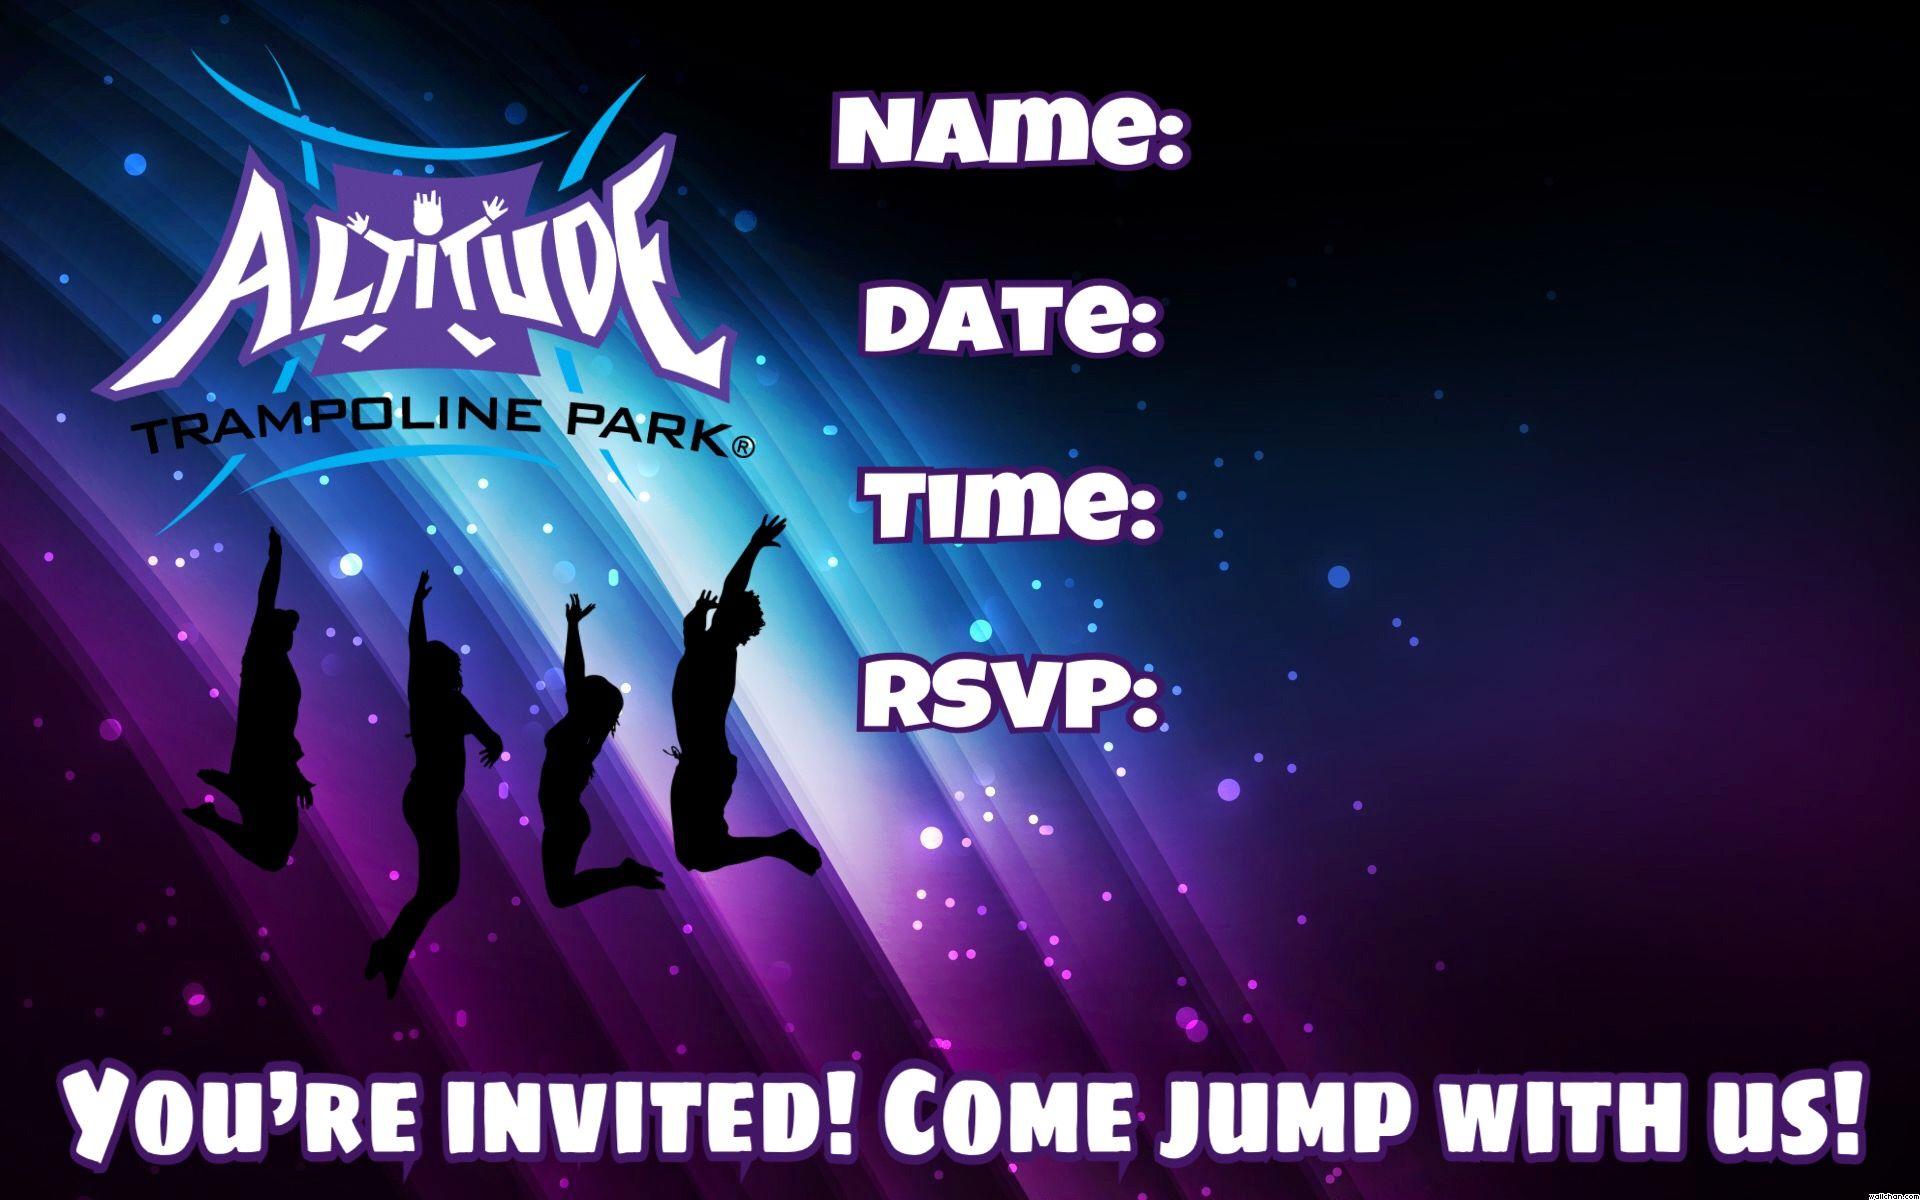 Altitude Trampoline Park Invitation Party Guests Birthday Celebration Chloe